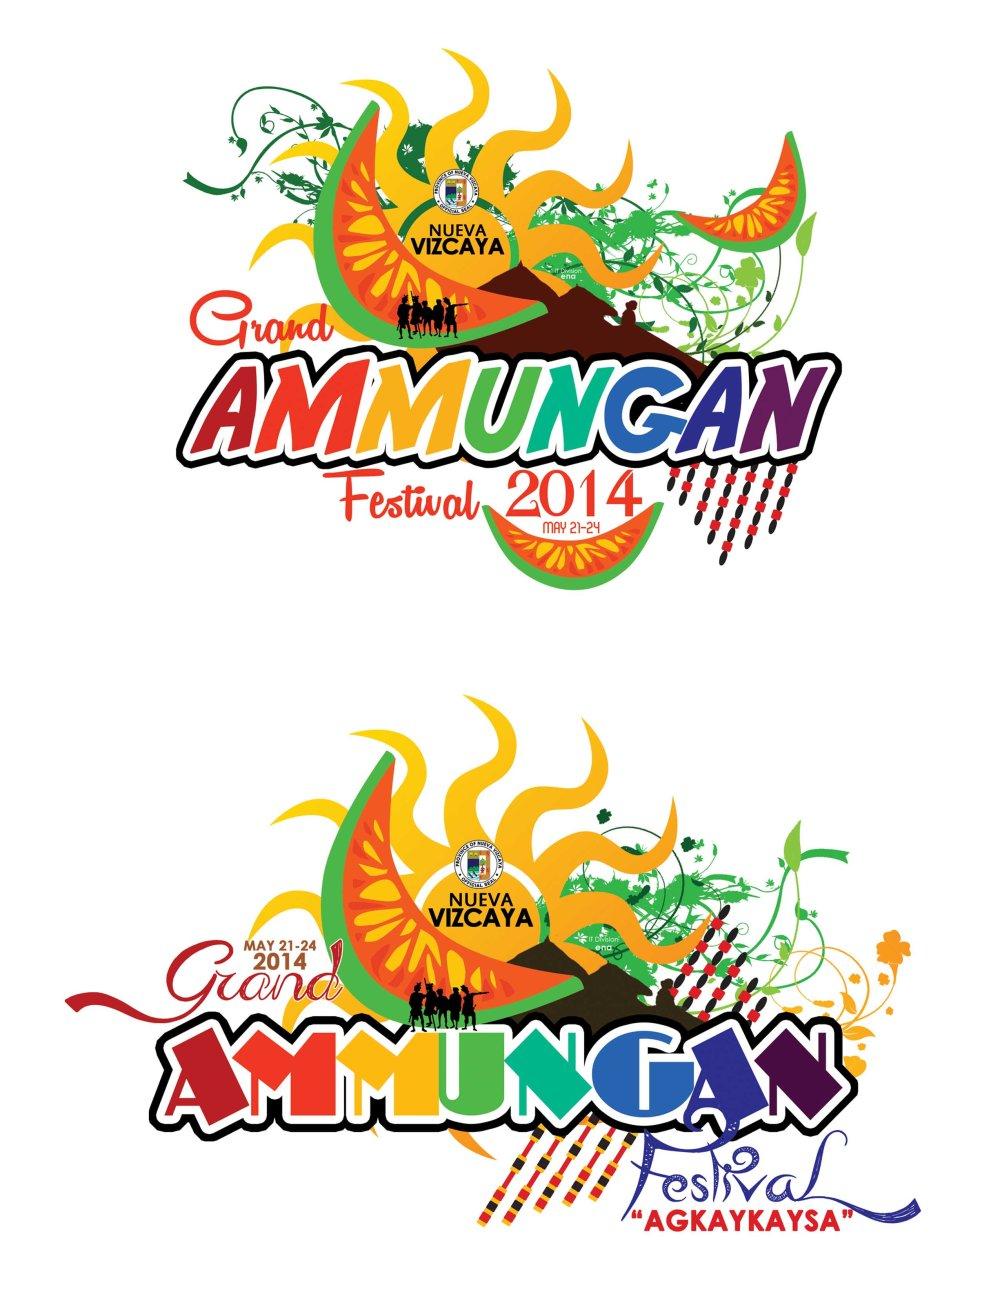 Ammungan Festival 2014 Logo